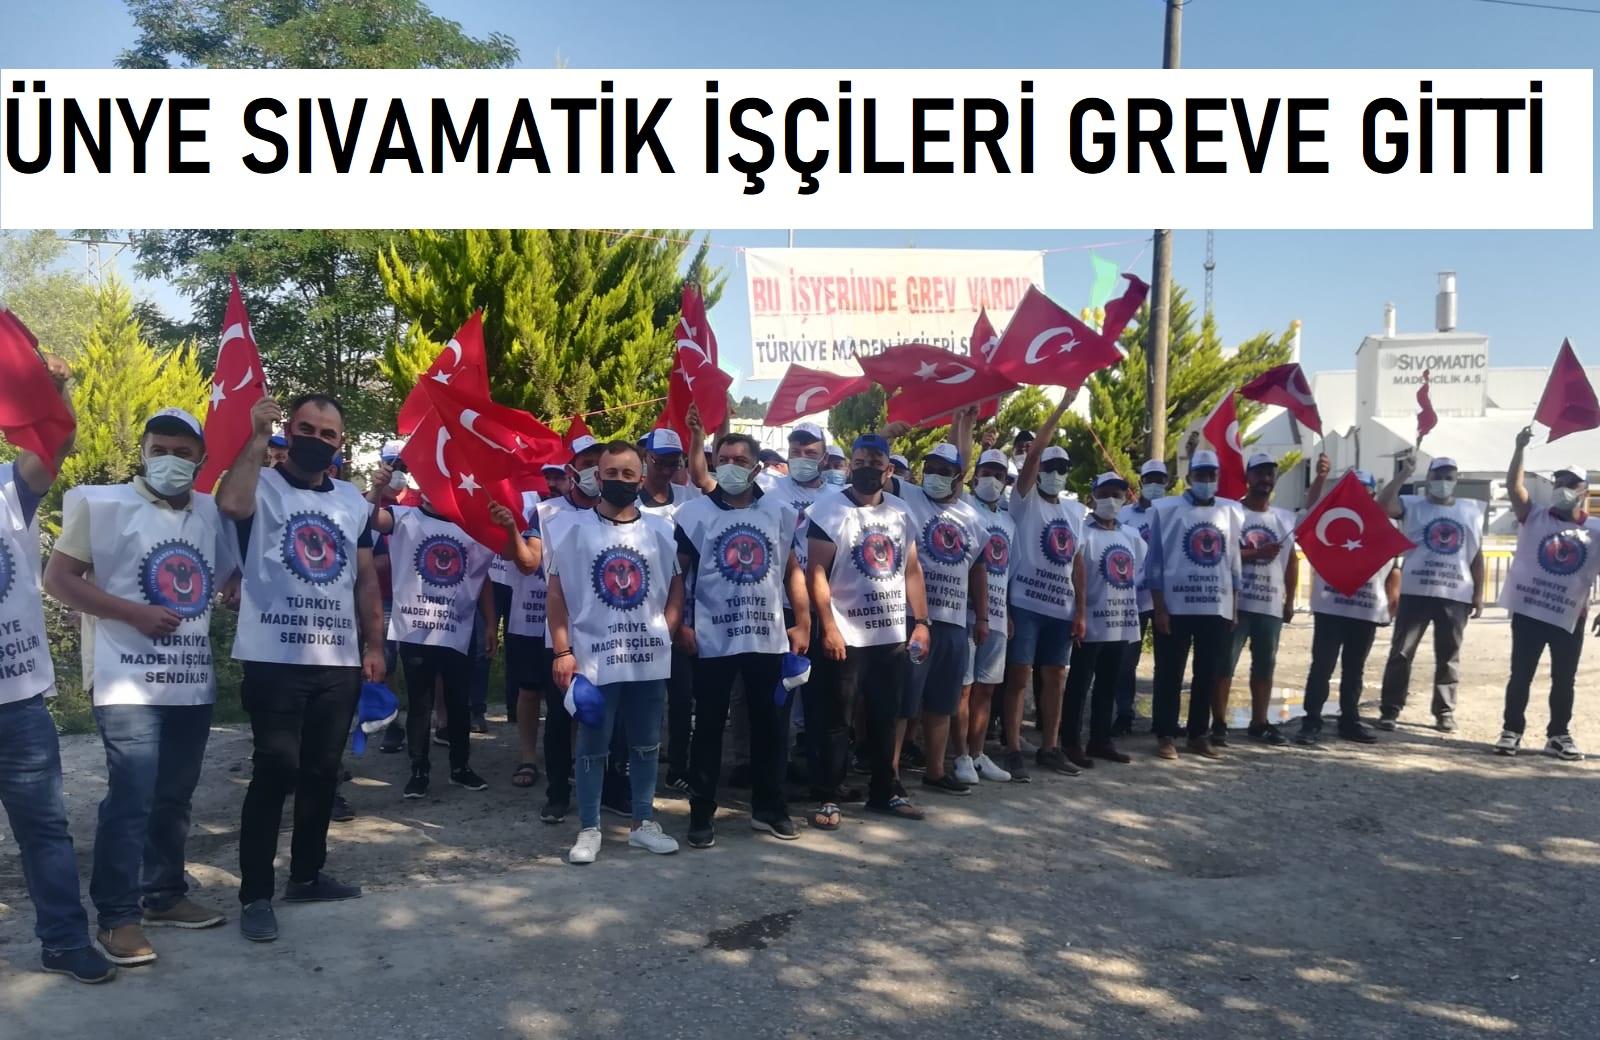 SİVOMATIC MADEN İŞCİLERİ GREVDE!